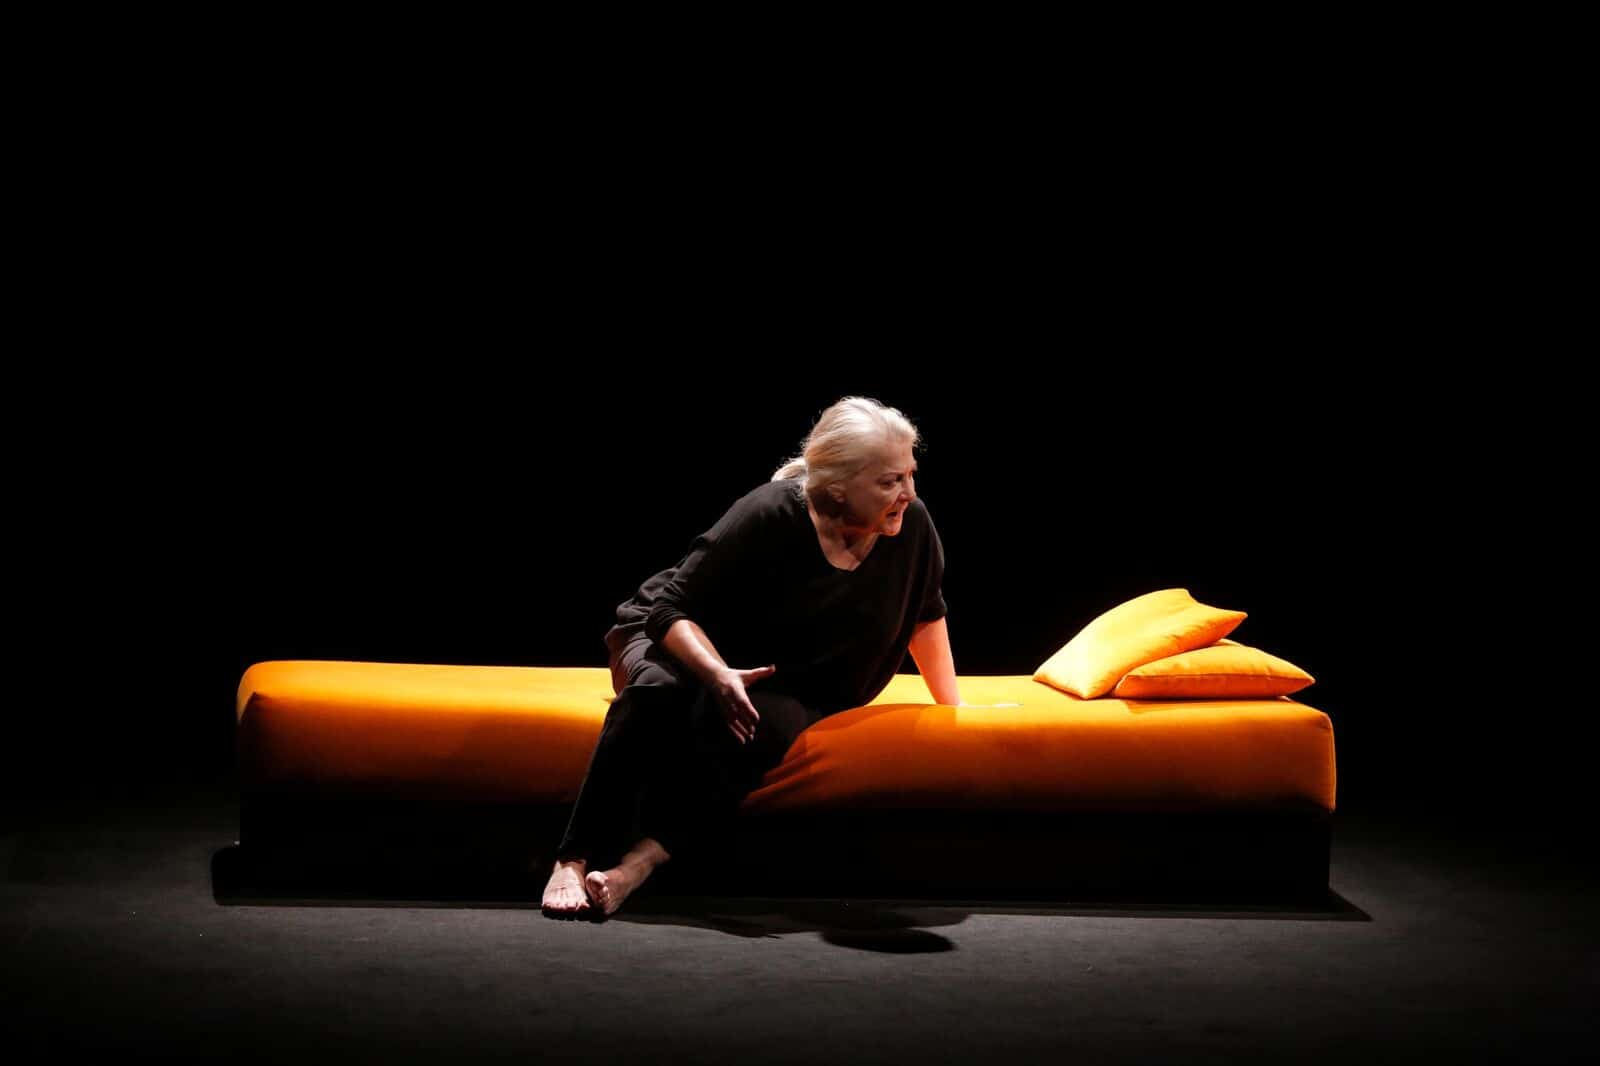 josiane balasko est la femme rompue du th tre h bertot lifestyle oblikon. Black Bedroom Furniture Sets. Home Design Ideas